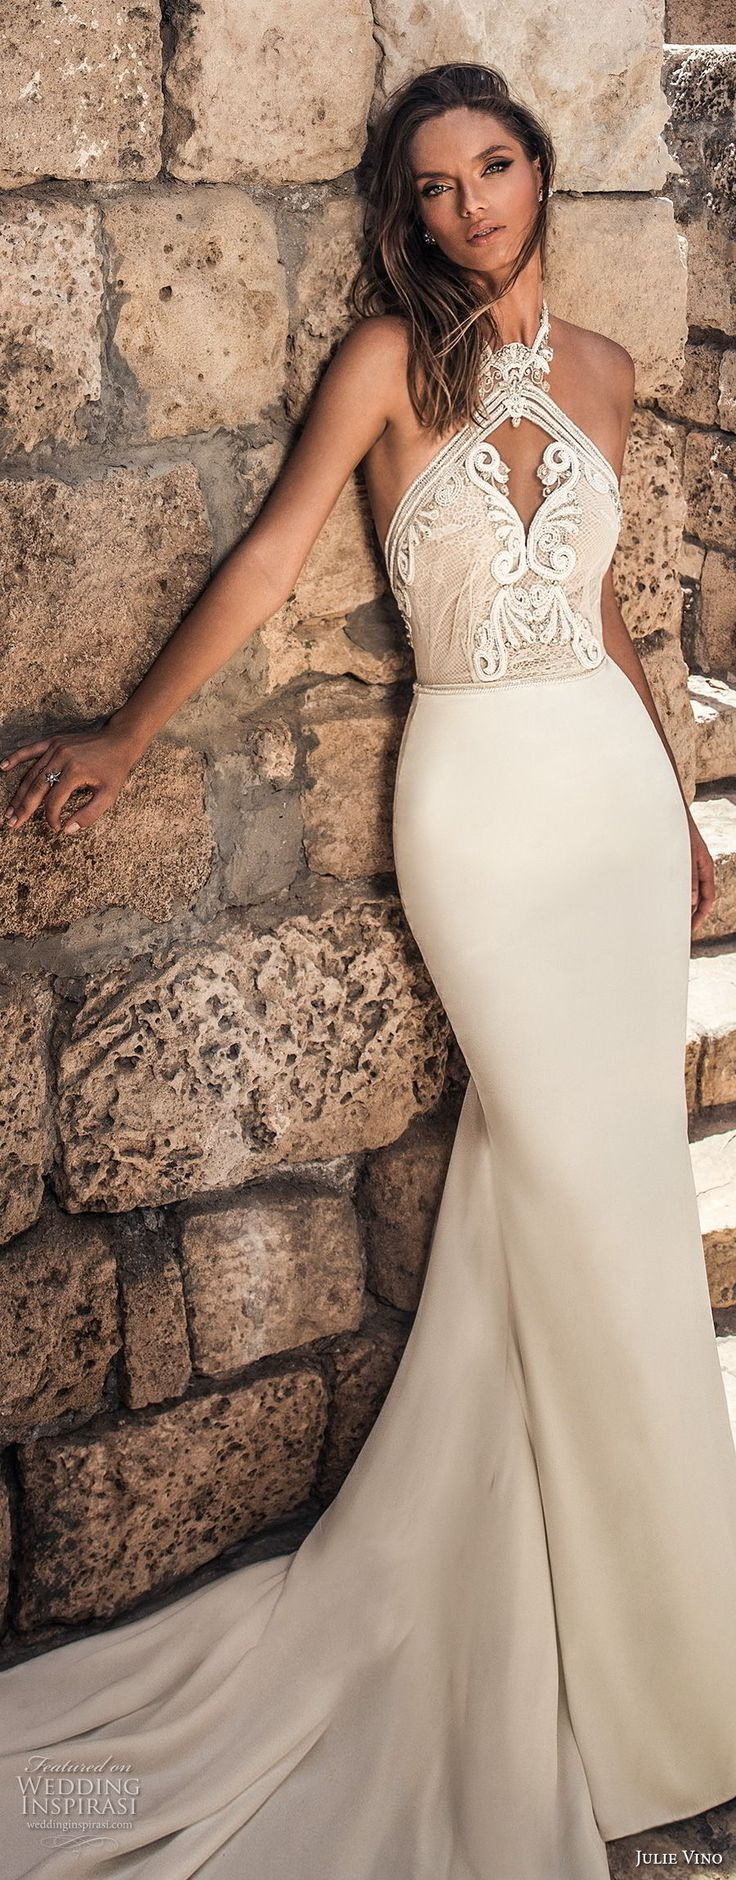 The Best Halter Wedding Dresses Ideas On Pinterest Halter